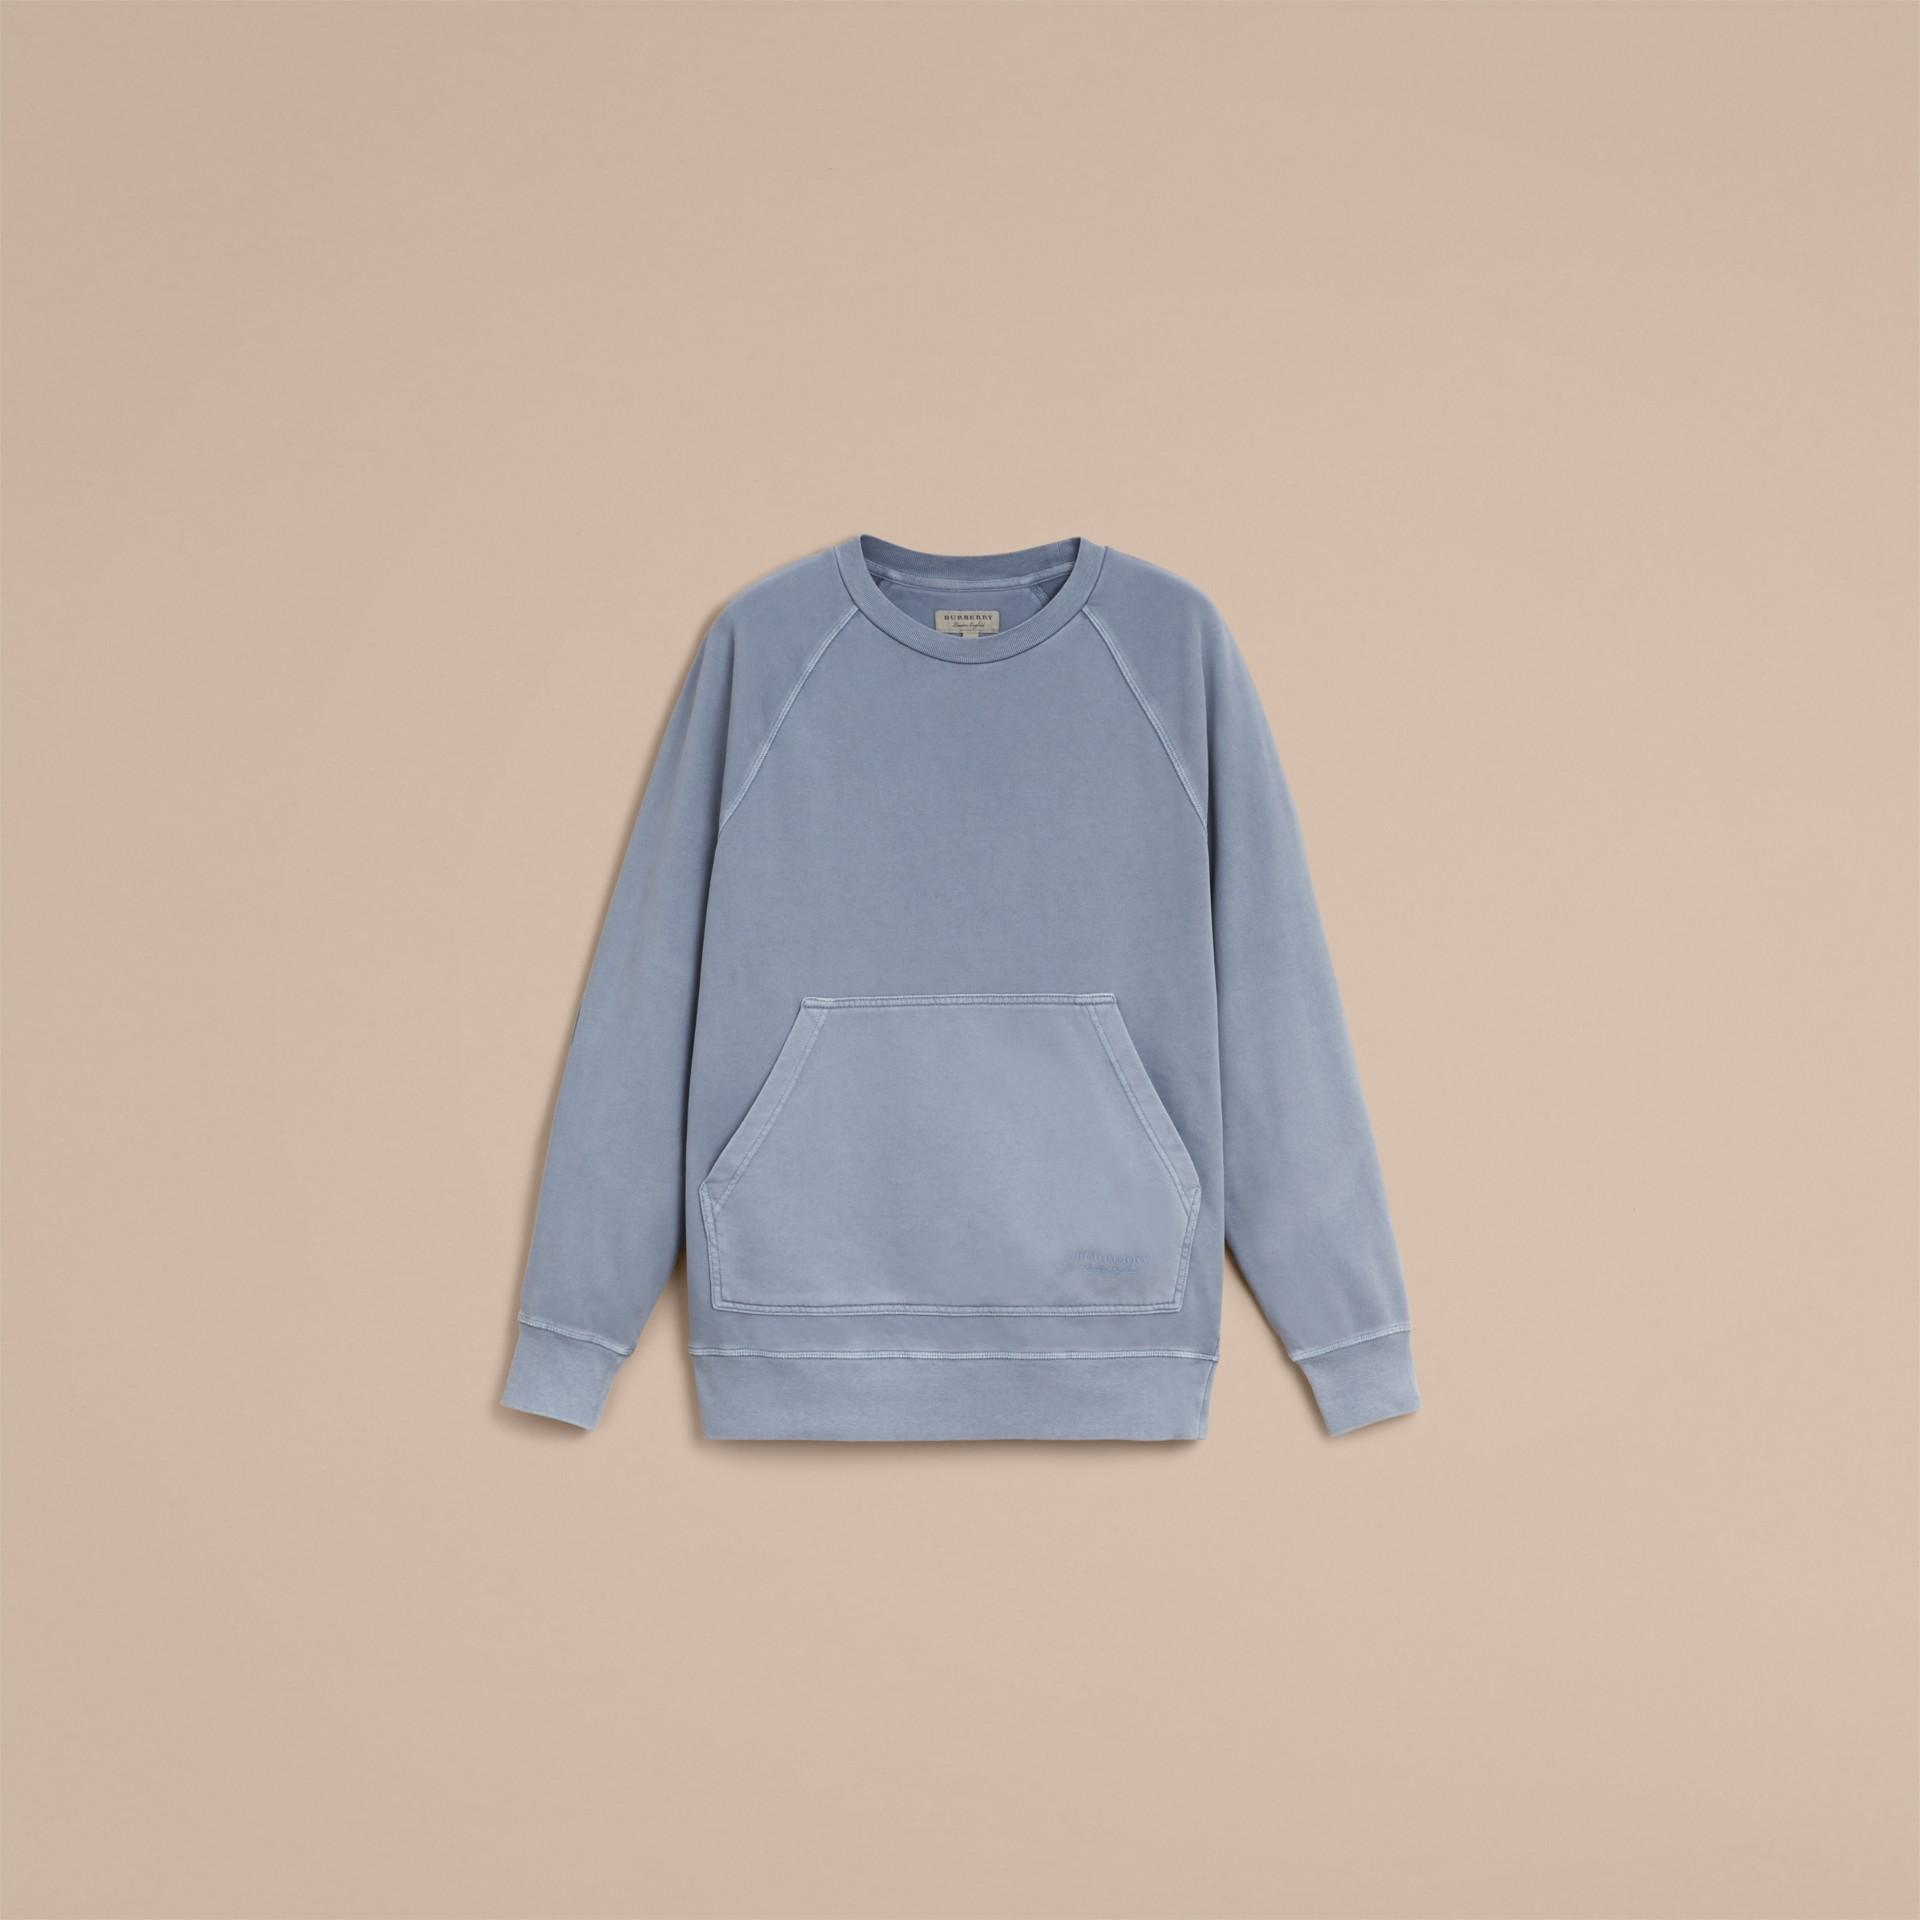 Unisex Pigment-dyed Cotton Oversize Sweatshirt in Dusty Blue - Women | Burberry Singapore - gallery image 4